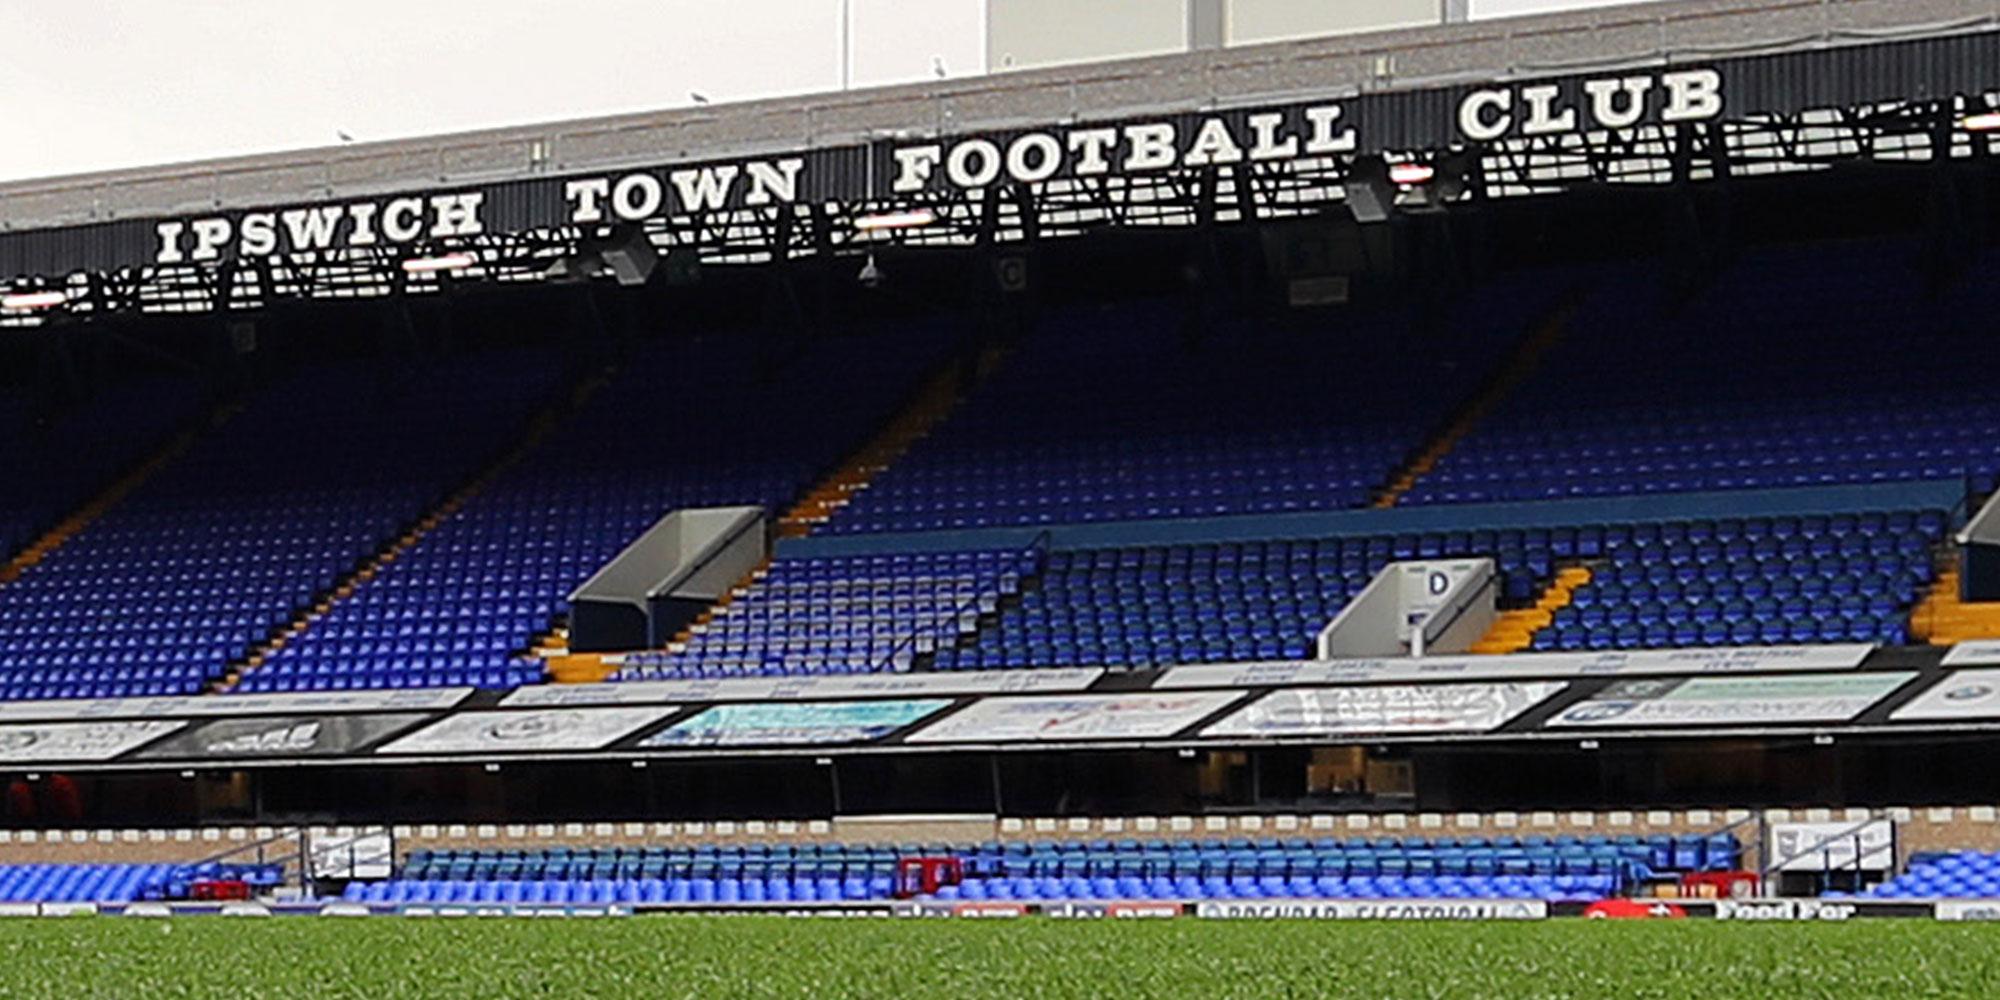 Ipswich Town v Crewe Alexandra